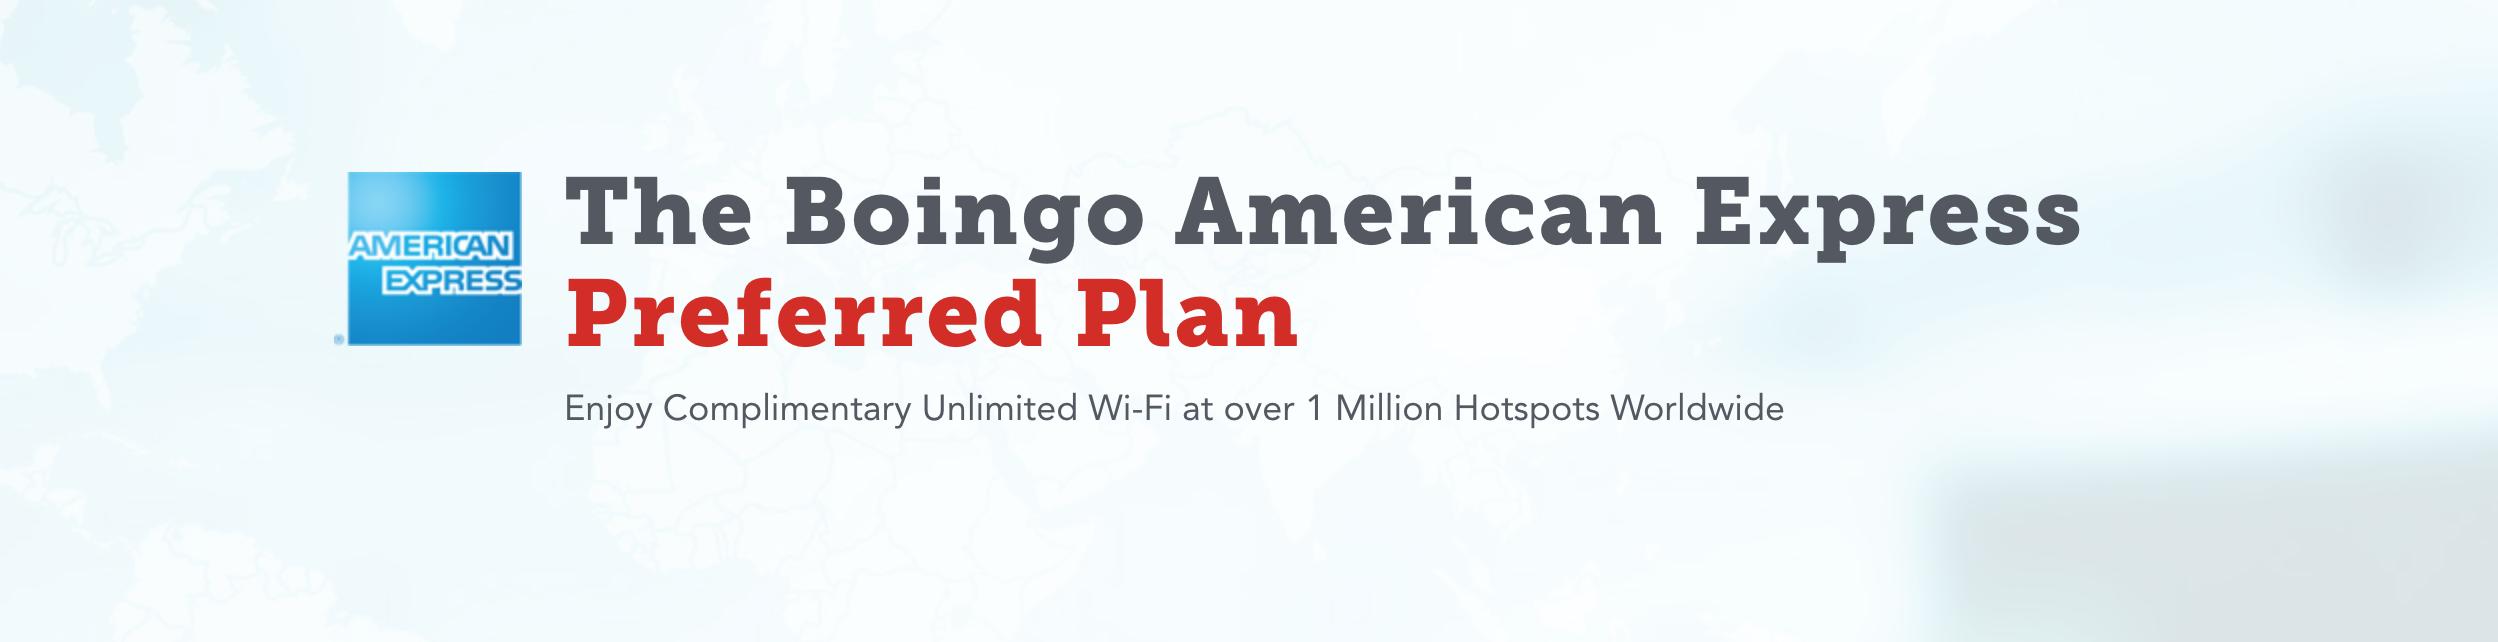 Amex Boingo Preferred Plan